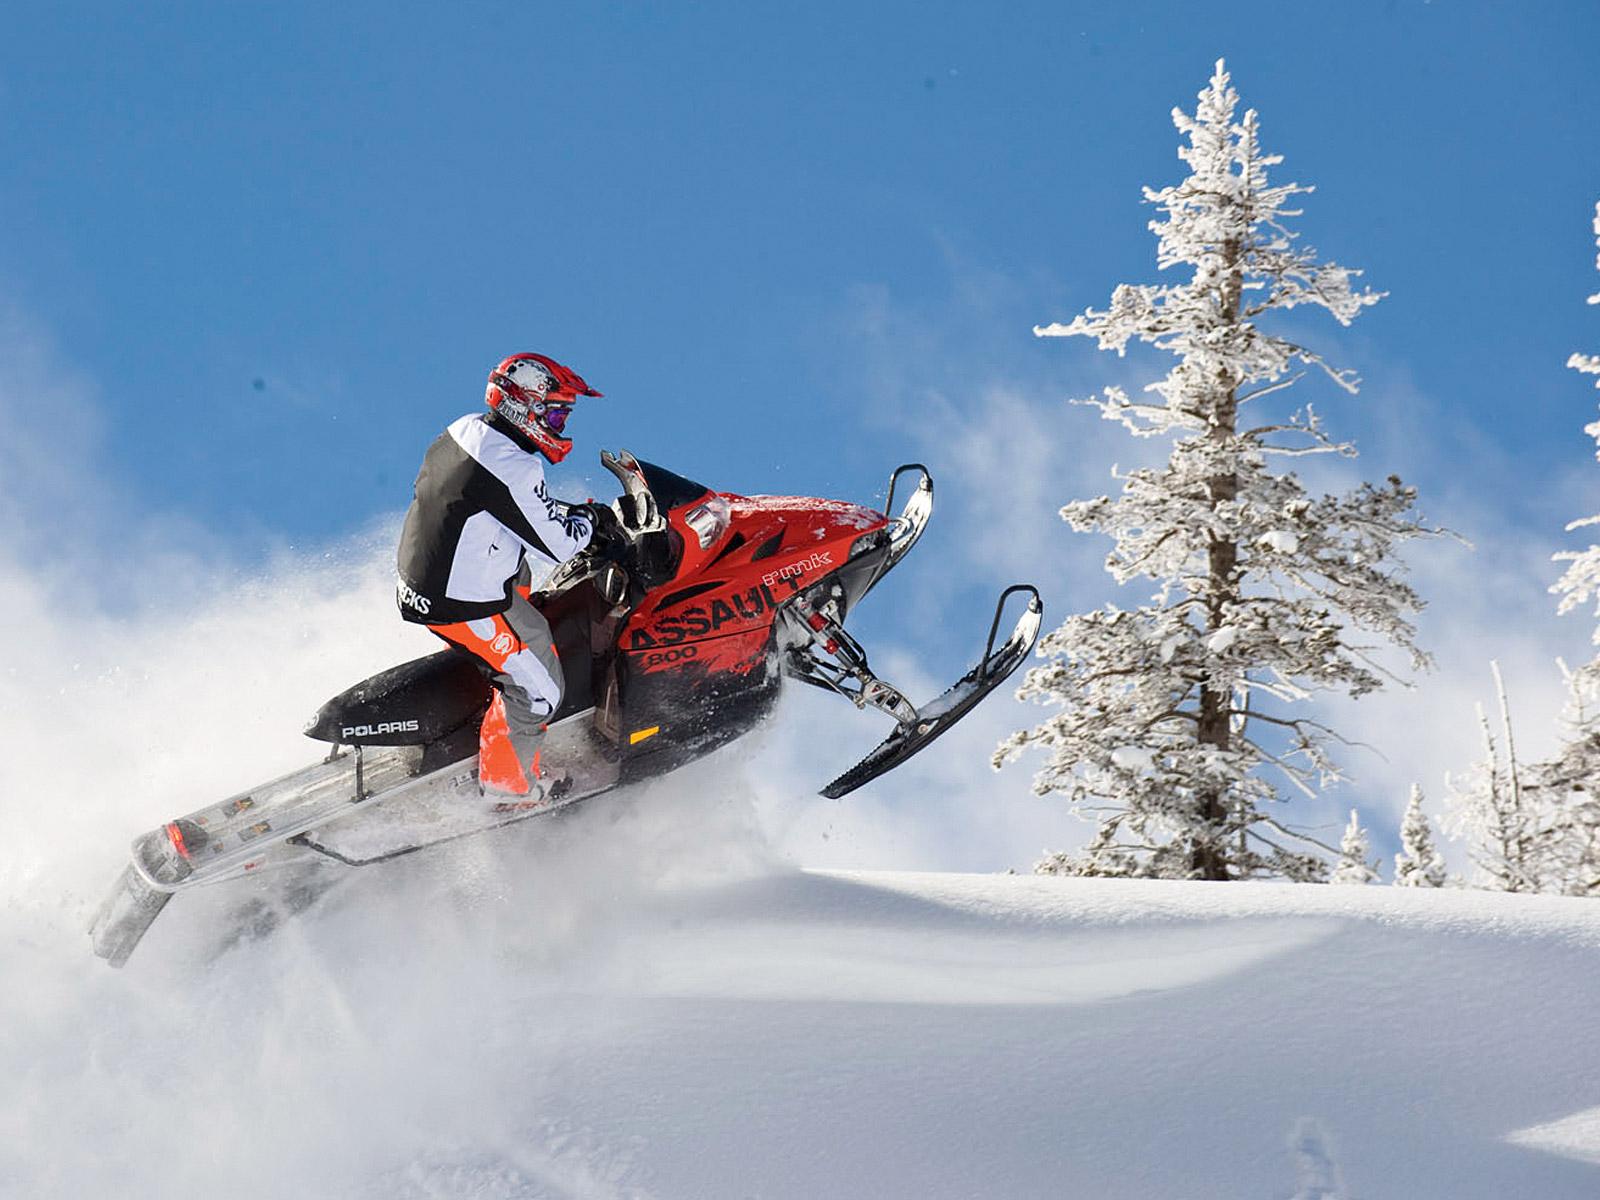 Polaris Rmk Assault Snowmobile Winter Sled Snow Fa   Polaris 1600x1200